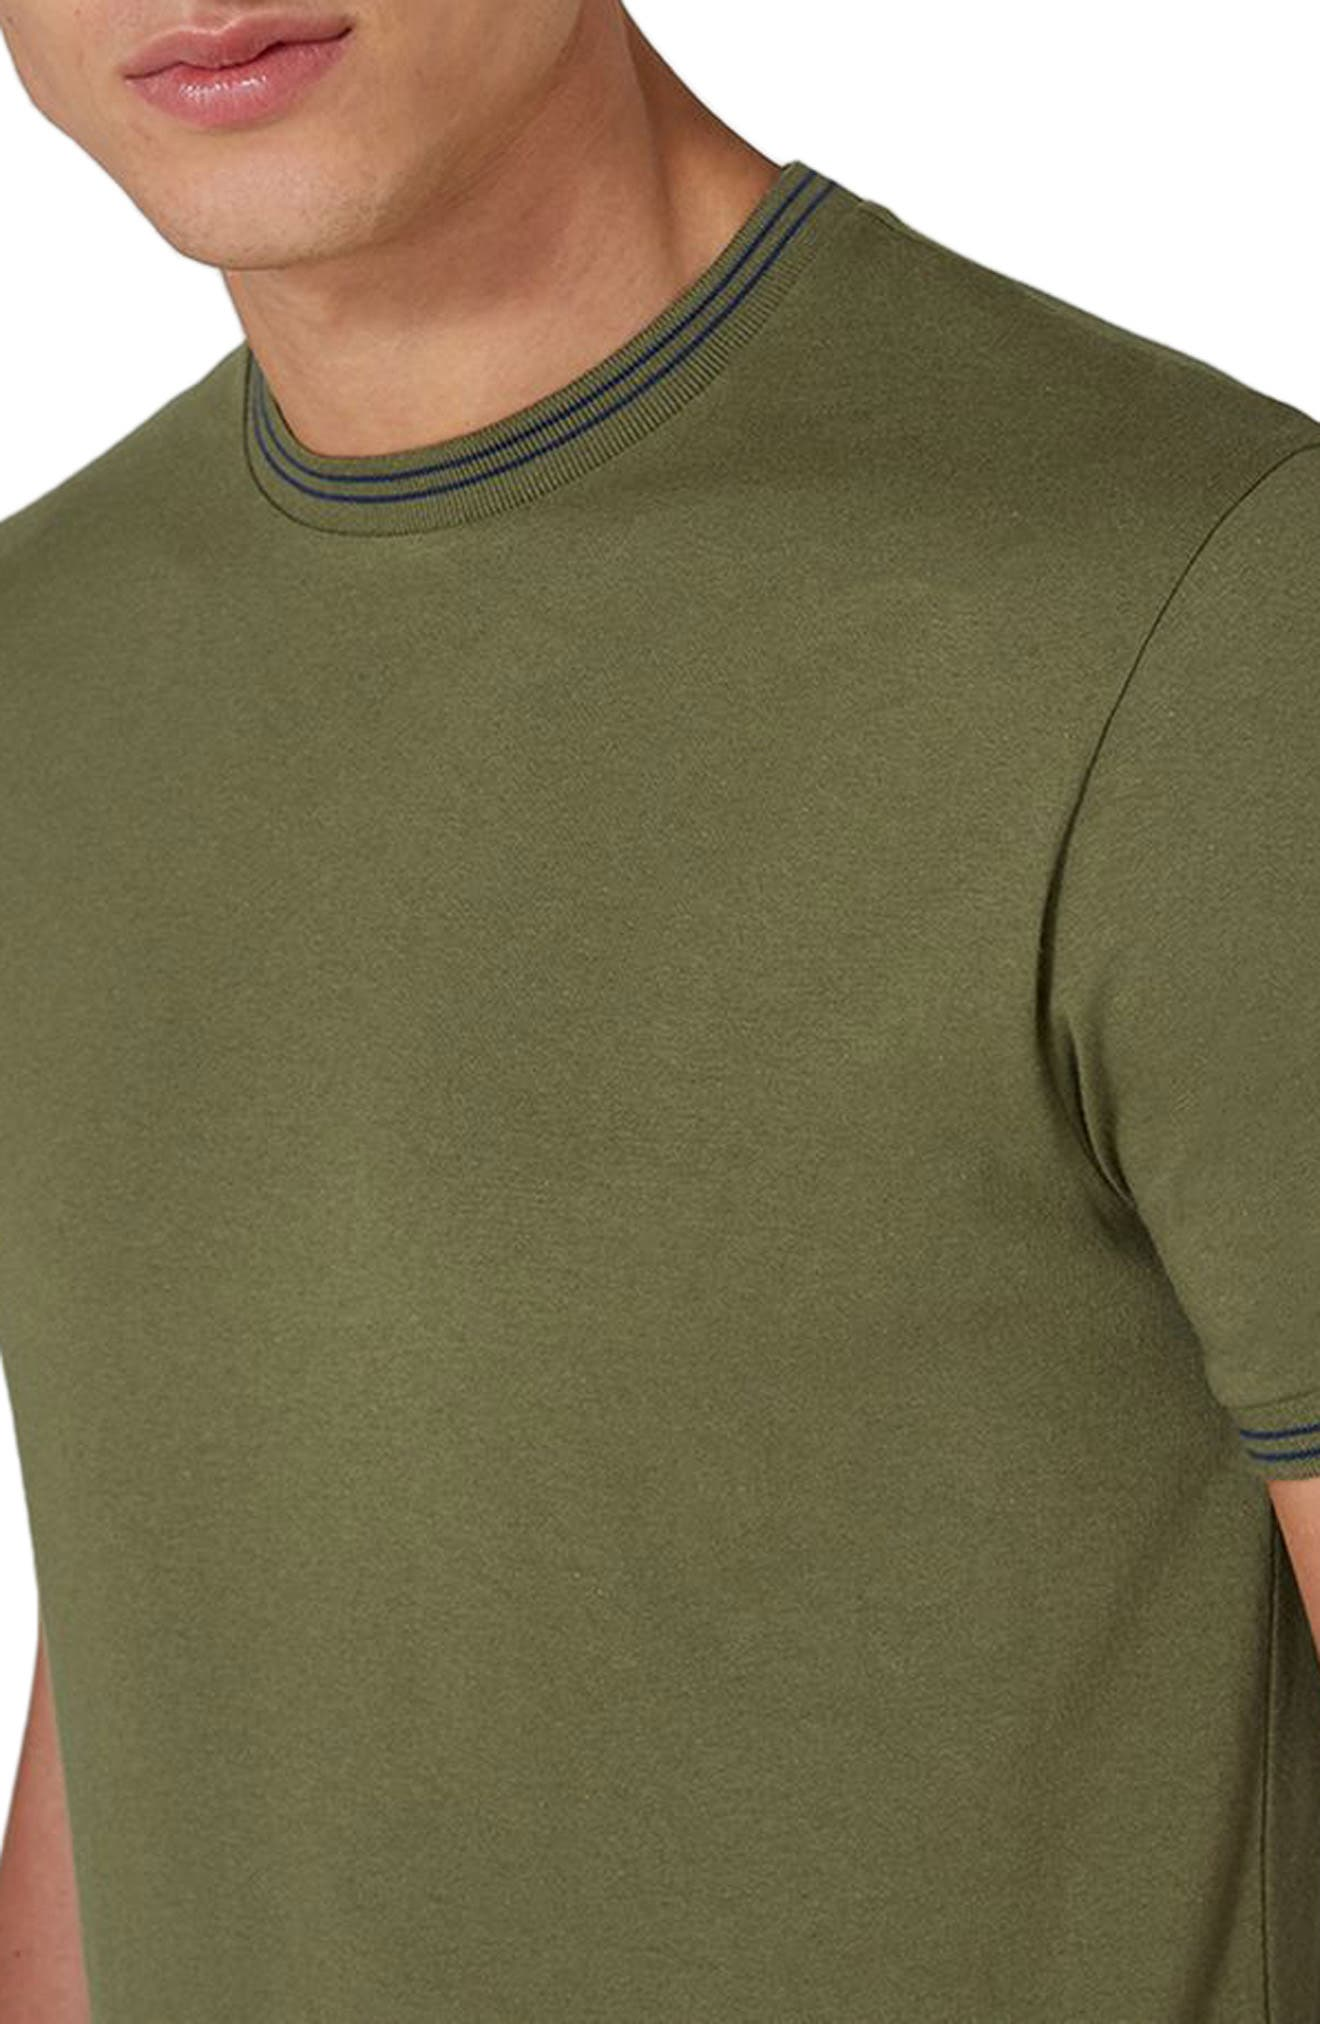 Stripe Muscle T-Shirt,                             Alternate thumbnail 3, color,                             Olive